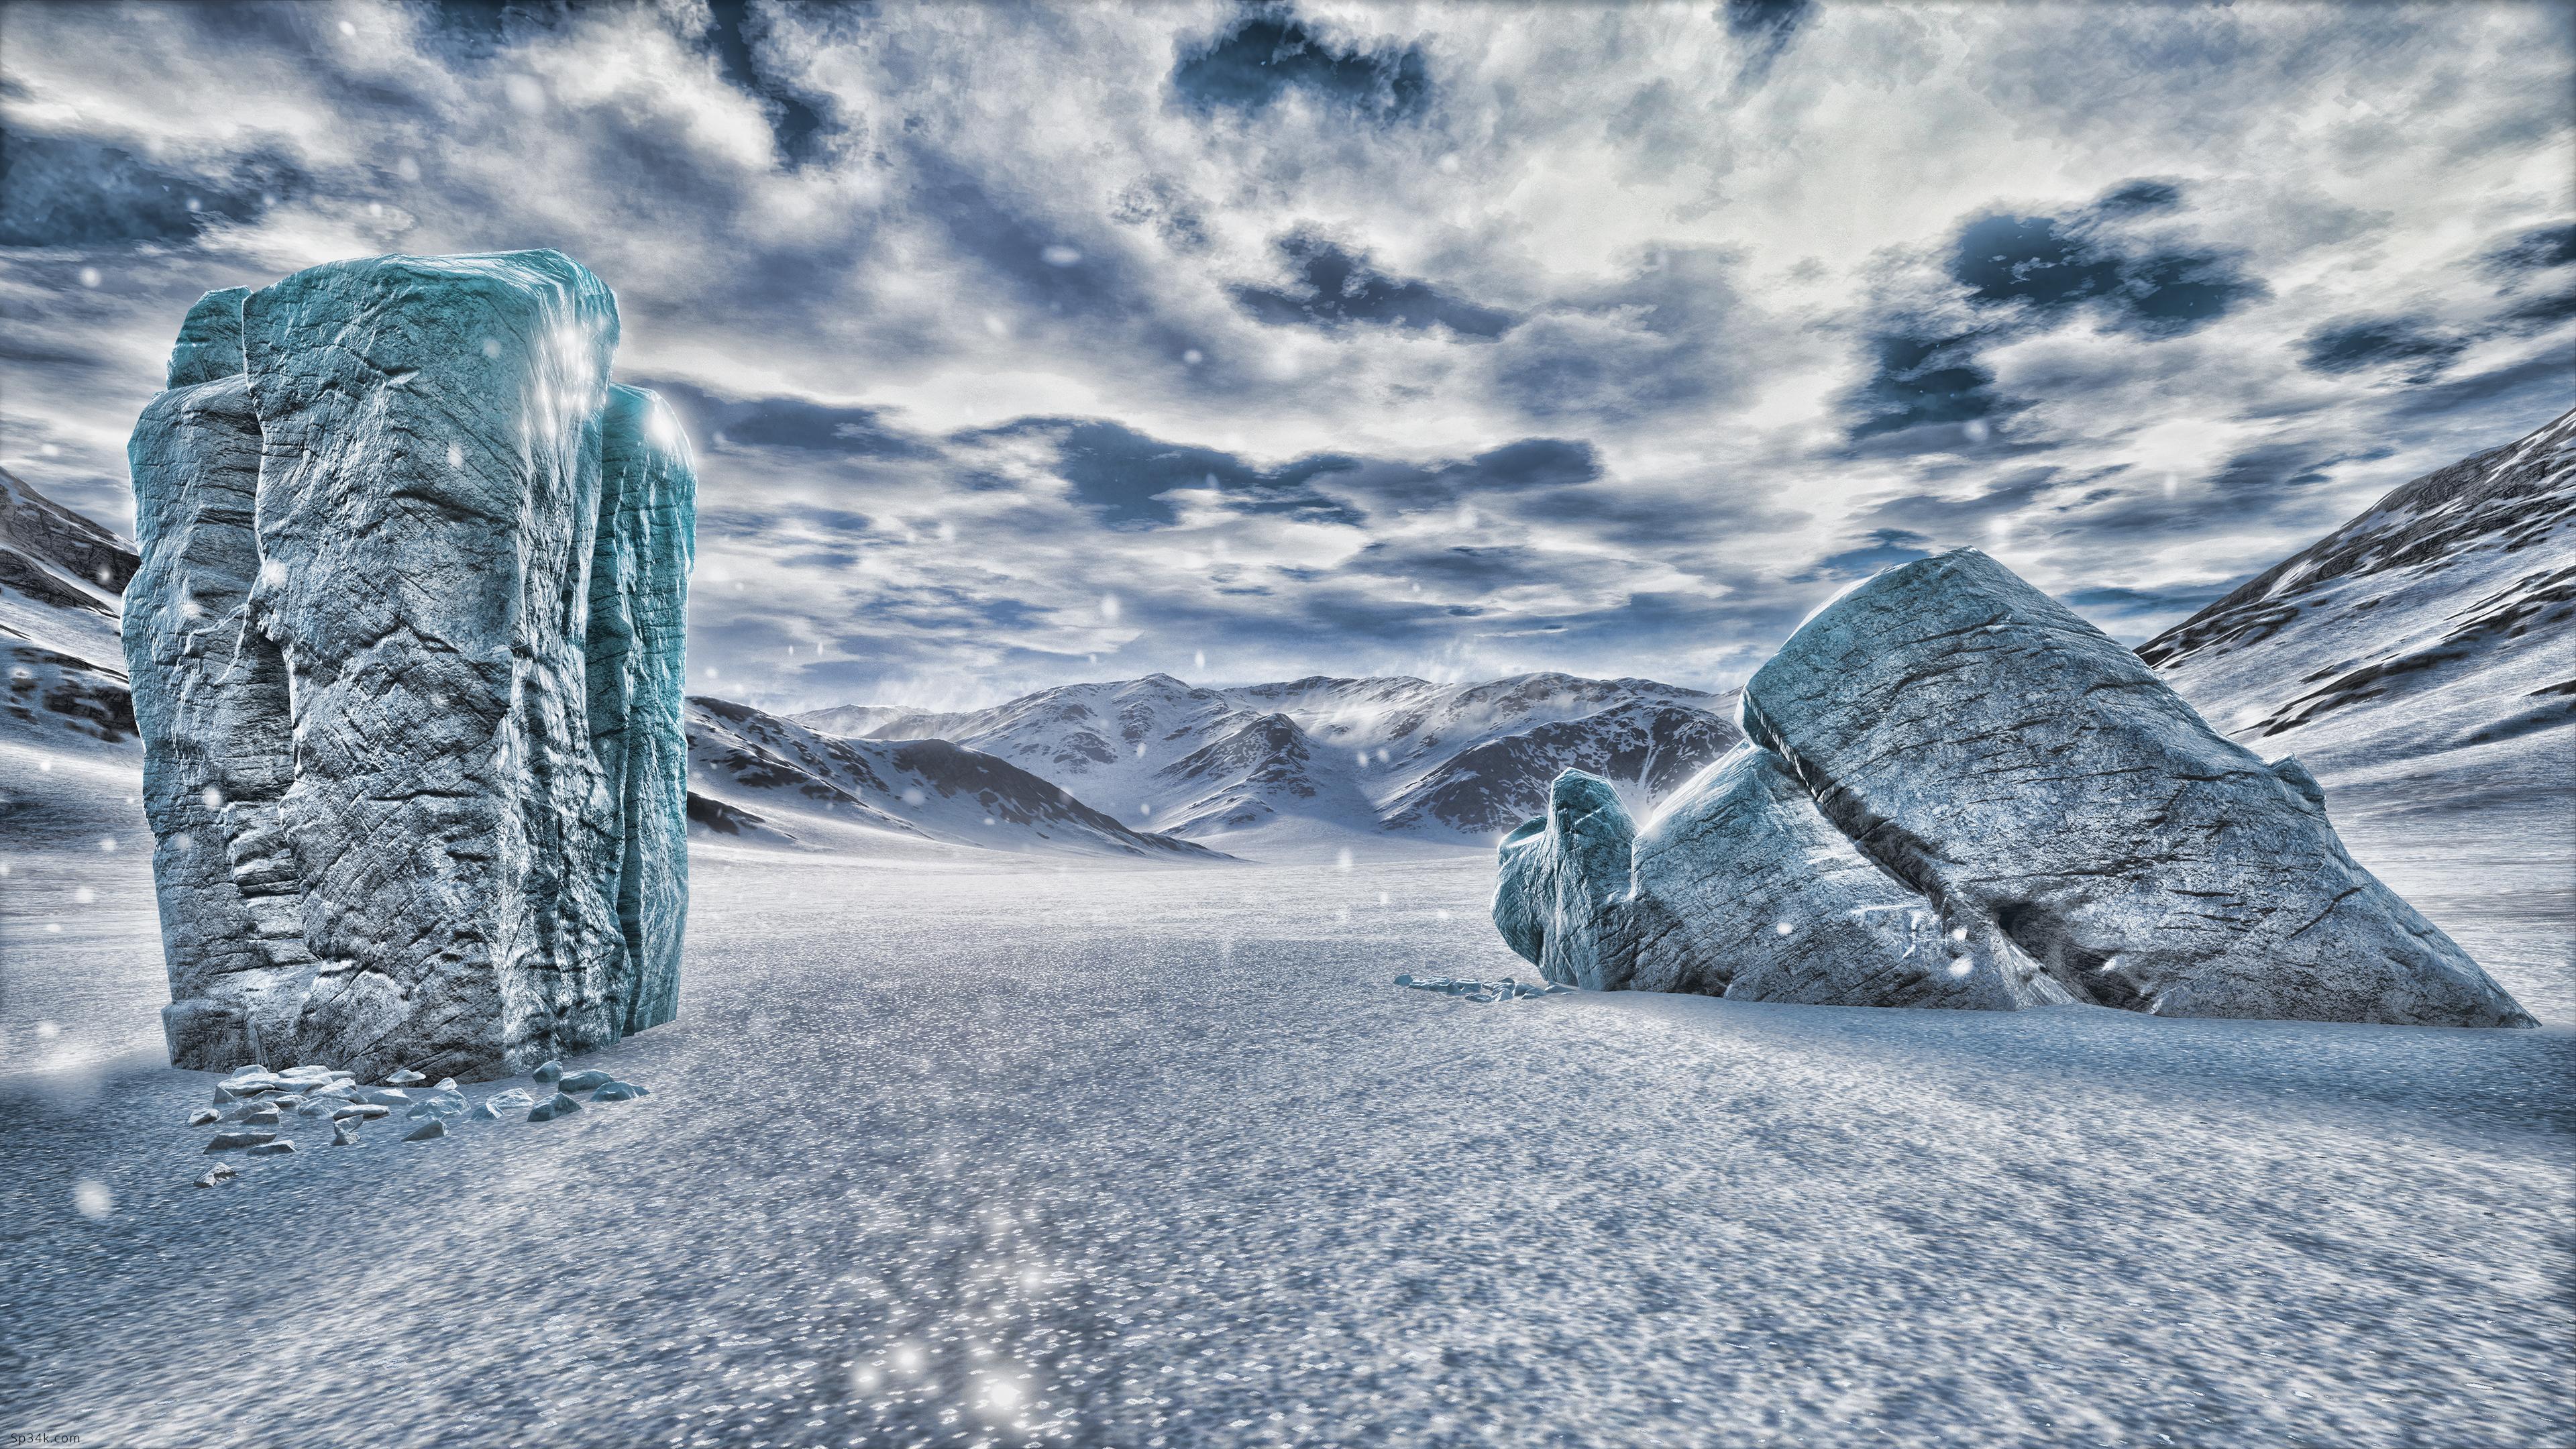 HDR Ice pillars